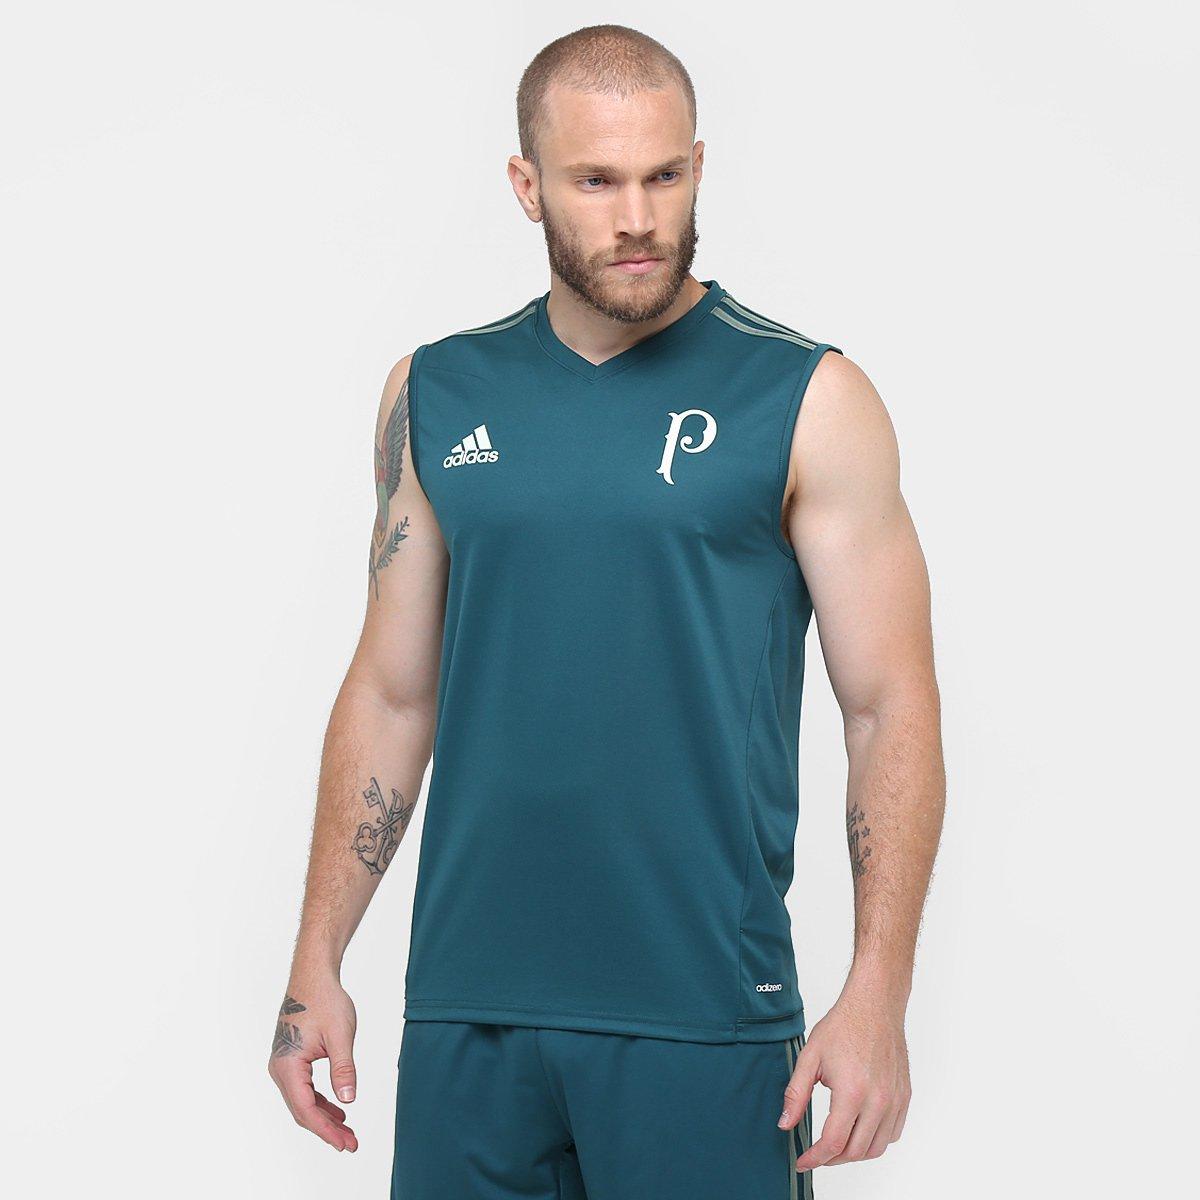 f497b770f803a Regata Palmeiras Treino 17/18 Adidas Masculina | Allianz Parque Shop